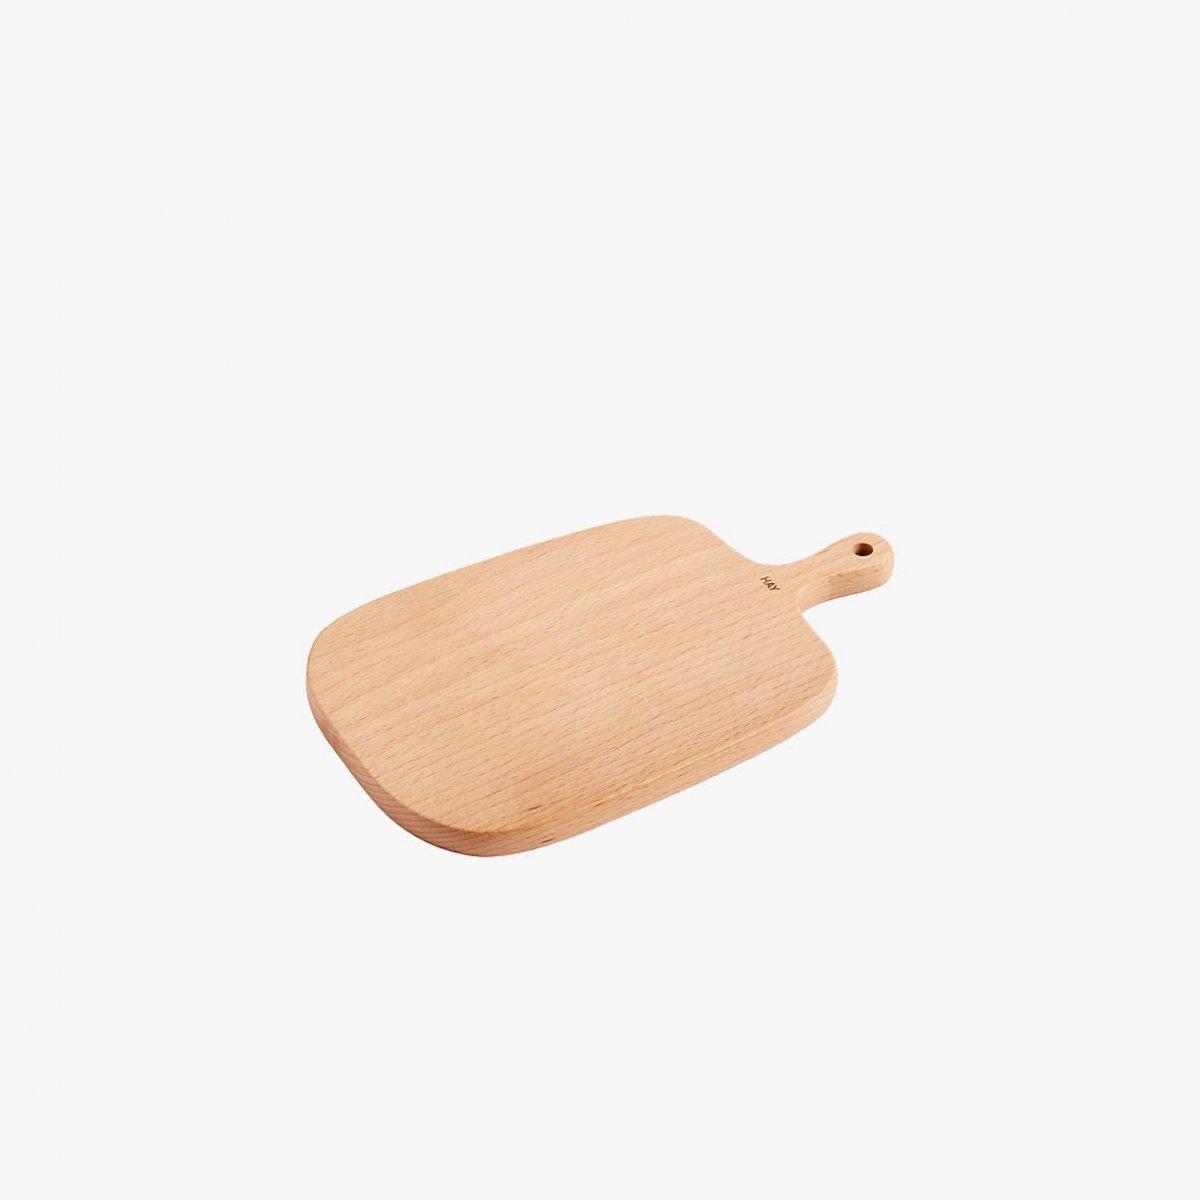 Plank Cutting Board, Rectangular, small.